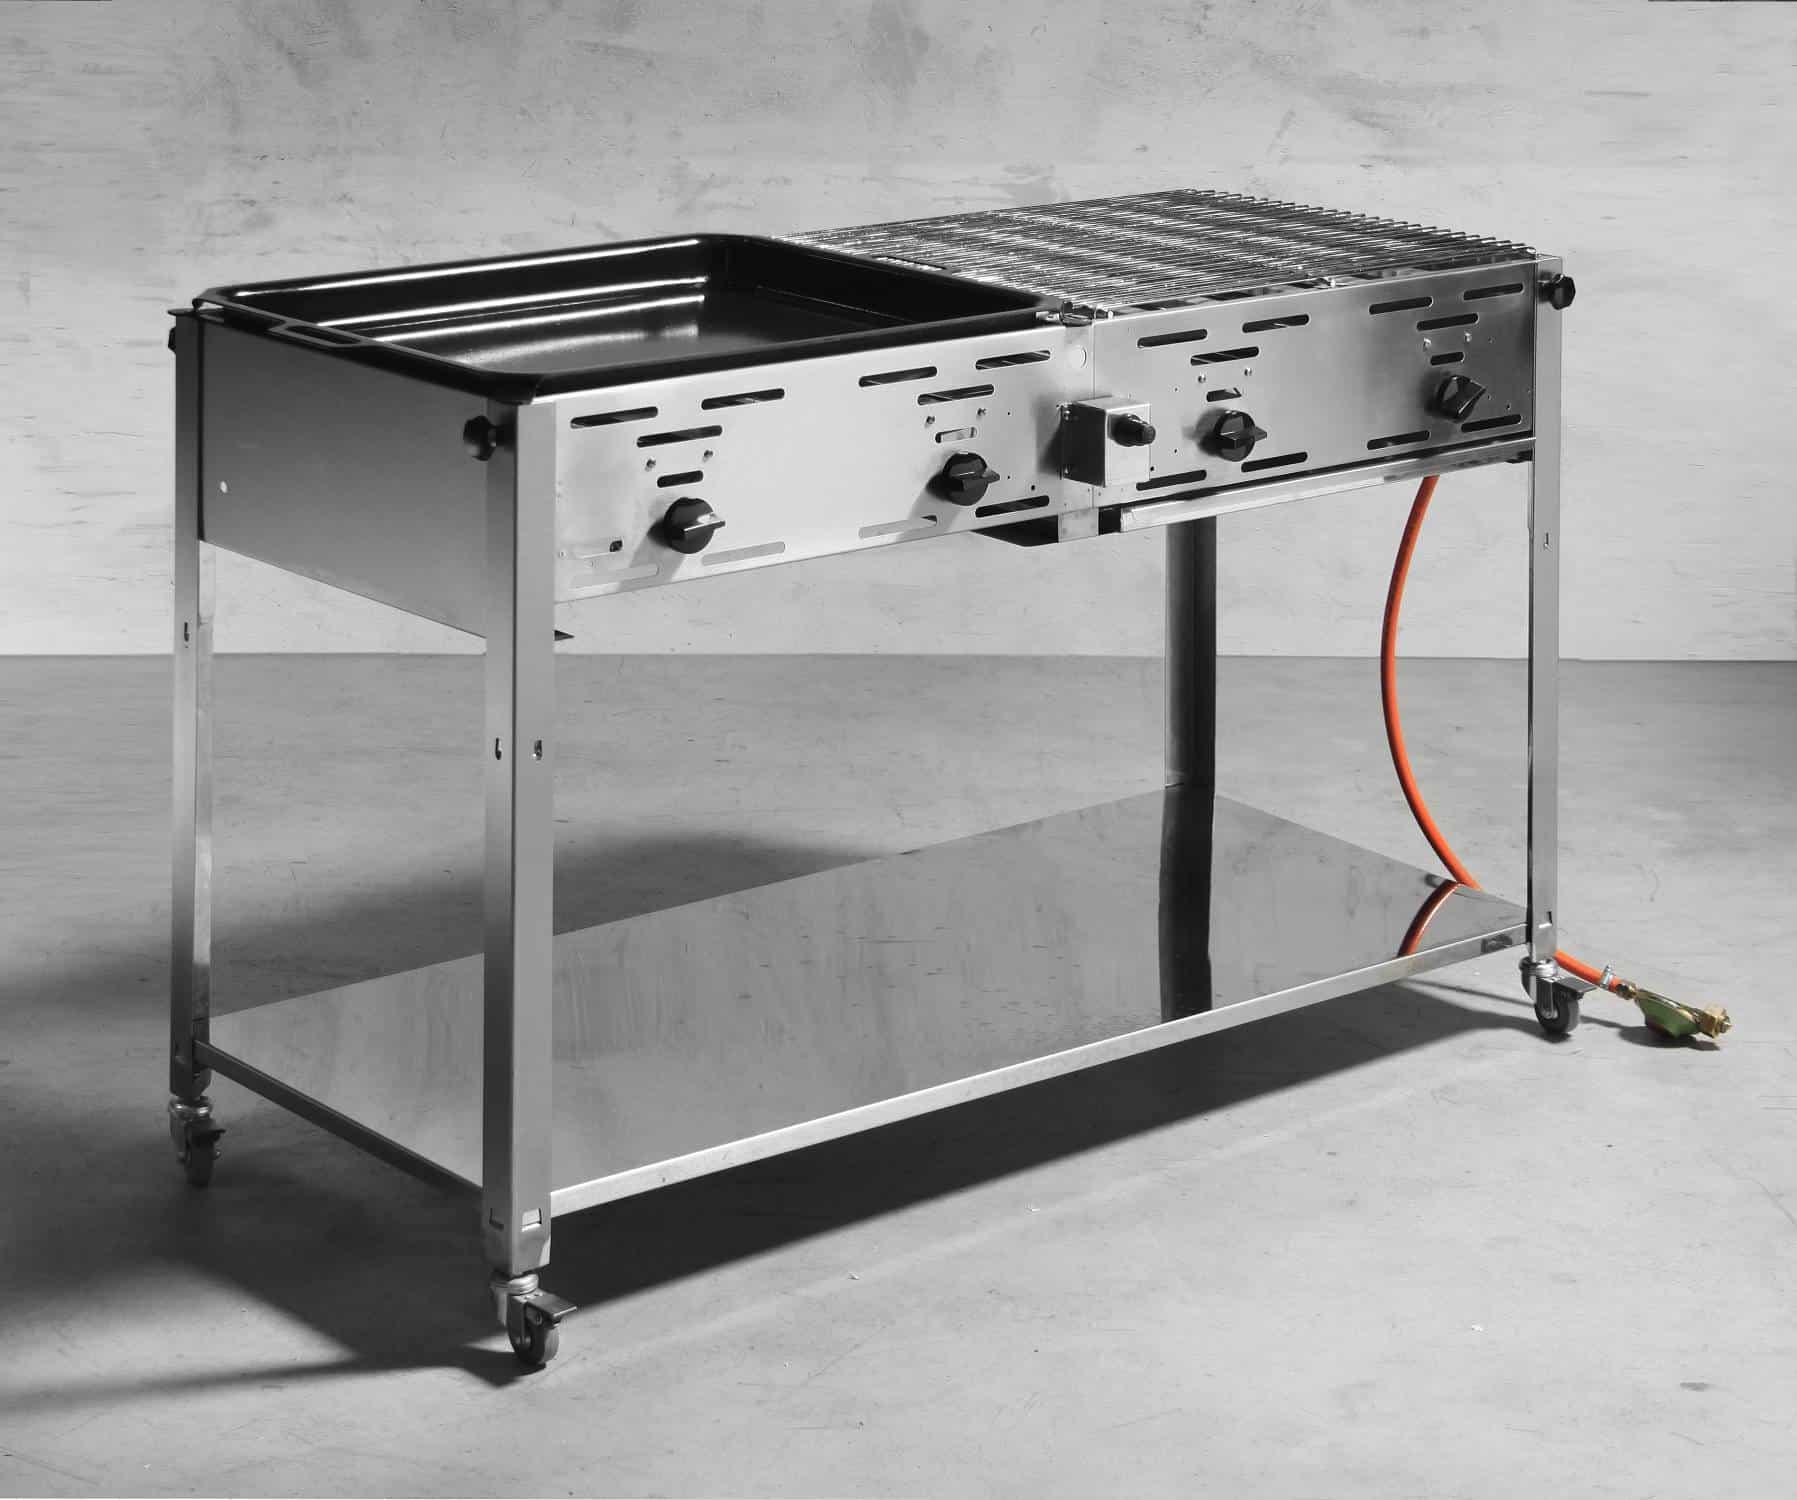 hendi gastro grill master quattro gas grill inkl grill und bratpfanne neu gastro. Black Bedroom Furniture Sets. Home Design Ideas